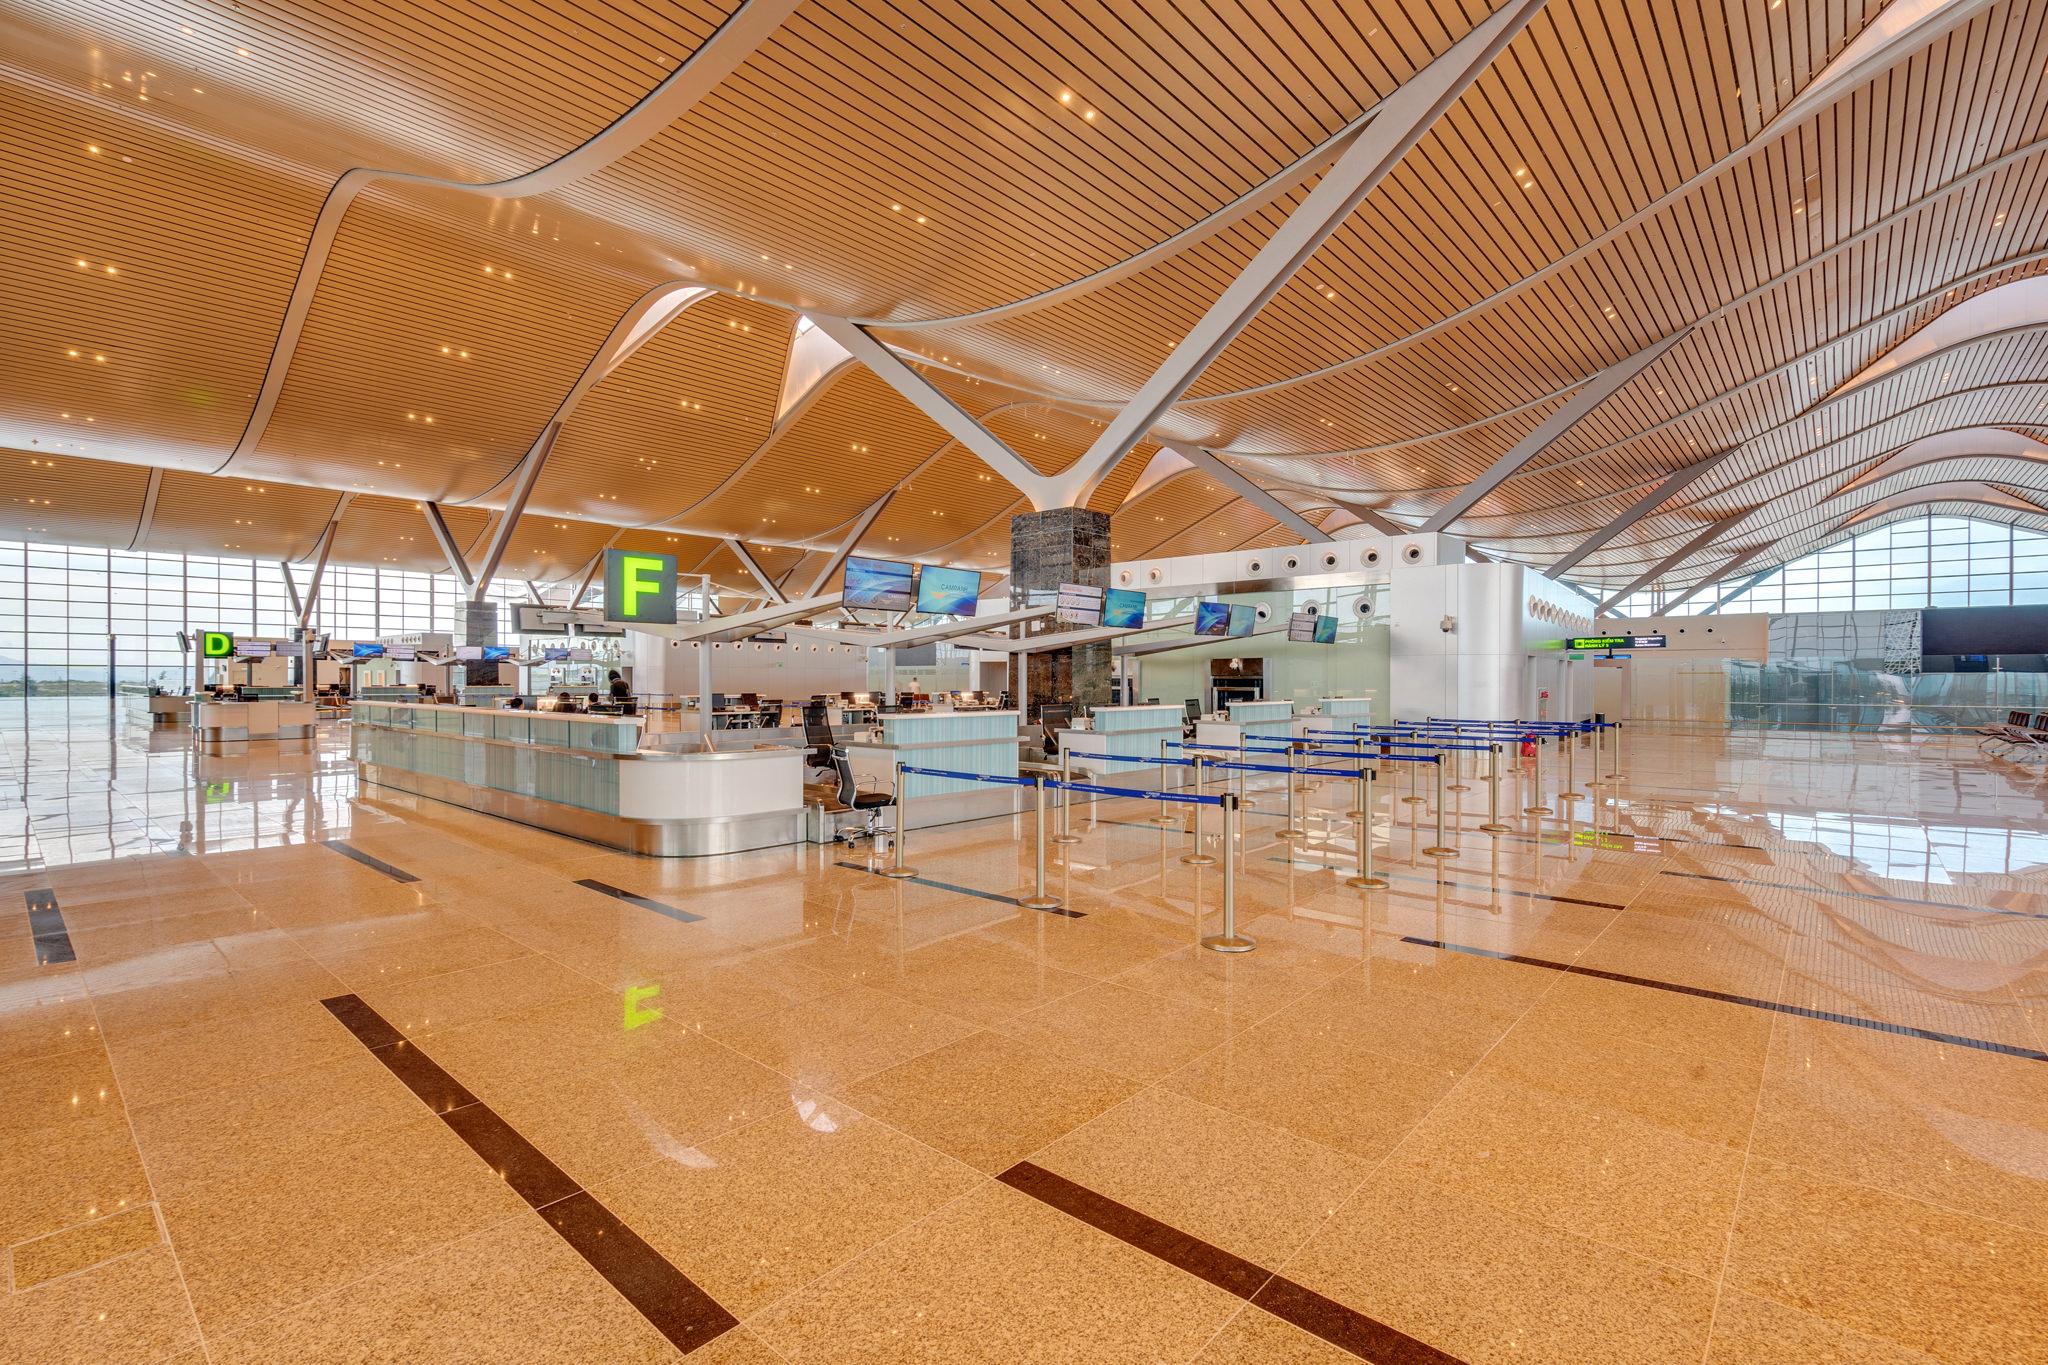 20180626 - Cam Ranh Airport - Architecture - 0364.jpg